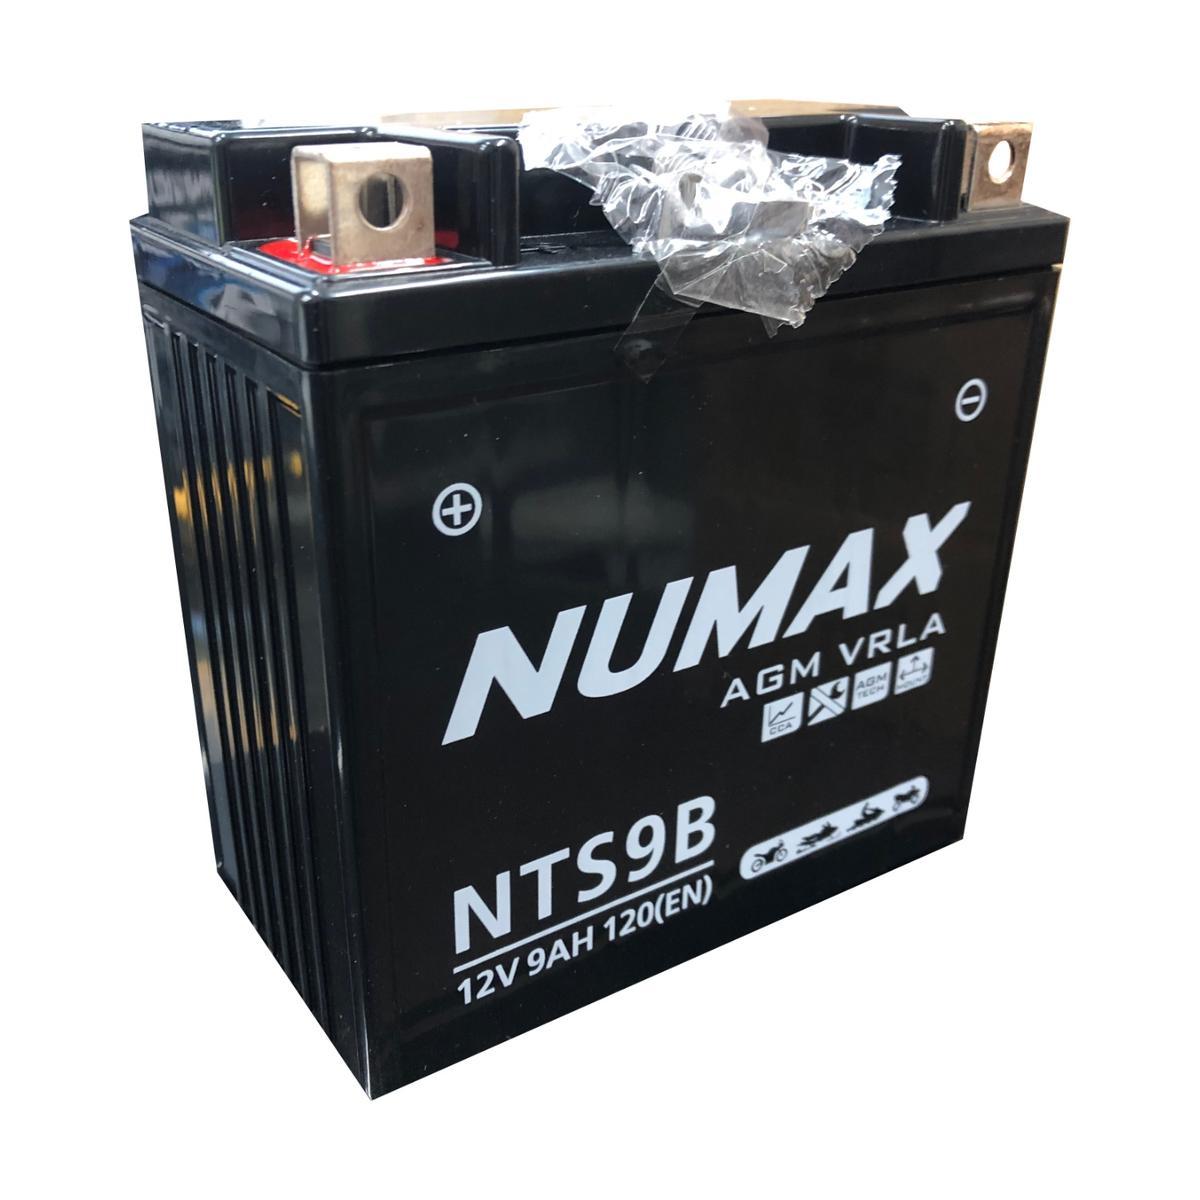 Numax NTS9B 12v Bike Motorbike Motorcycle Battery BSA 12 Volt 12 Volt 12N9-3B